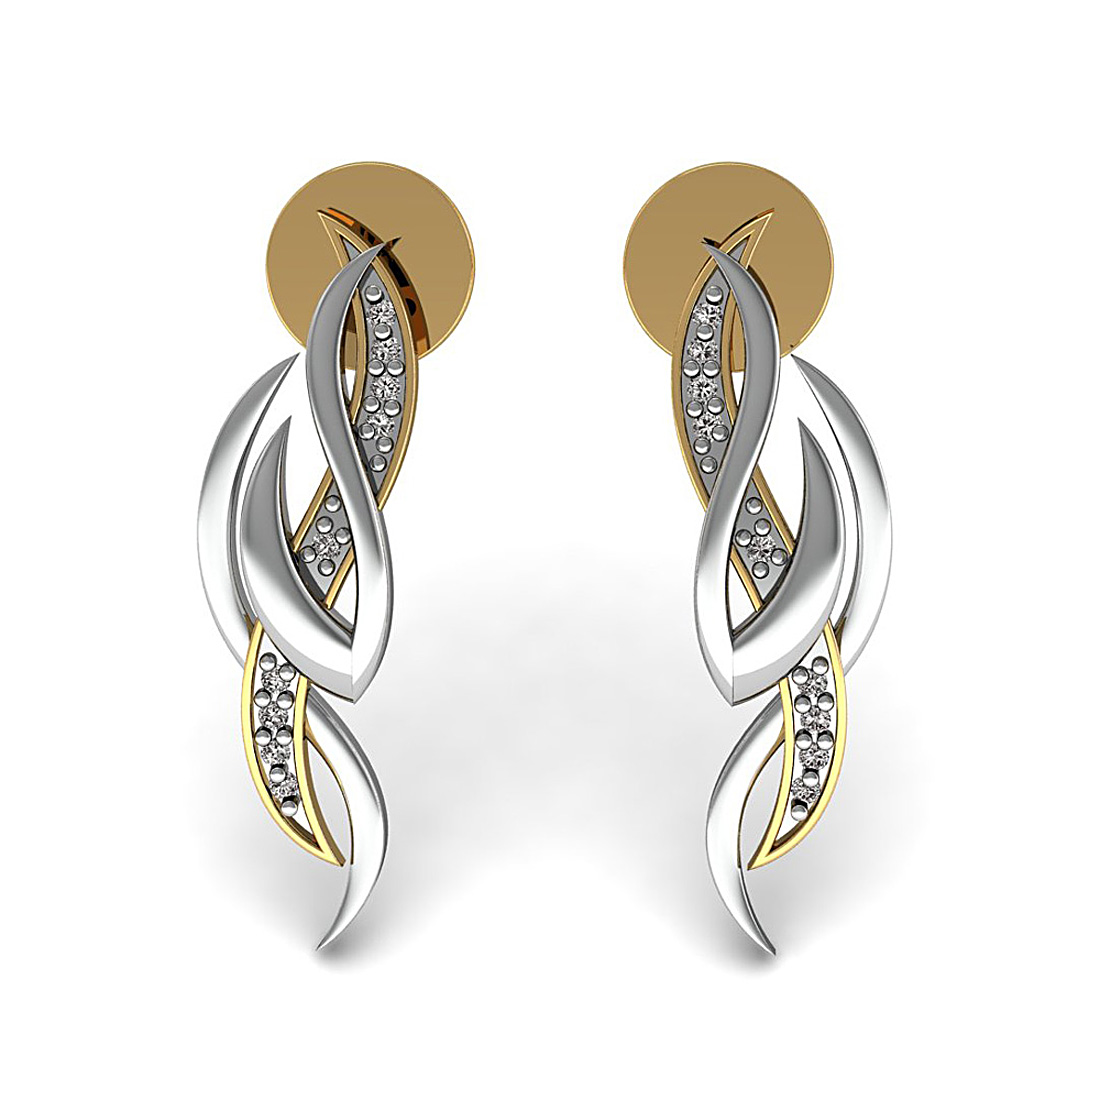 18k solid gold real diamond stud earrings